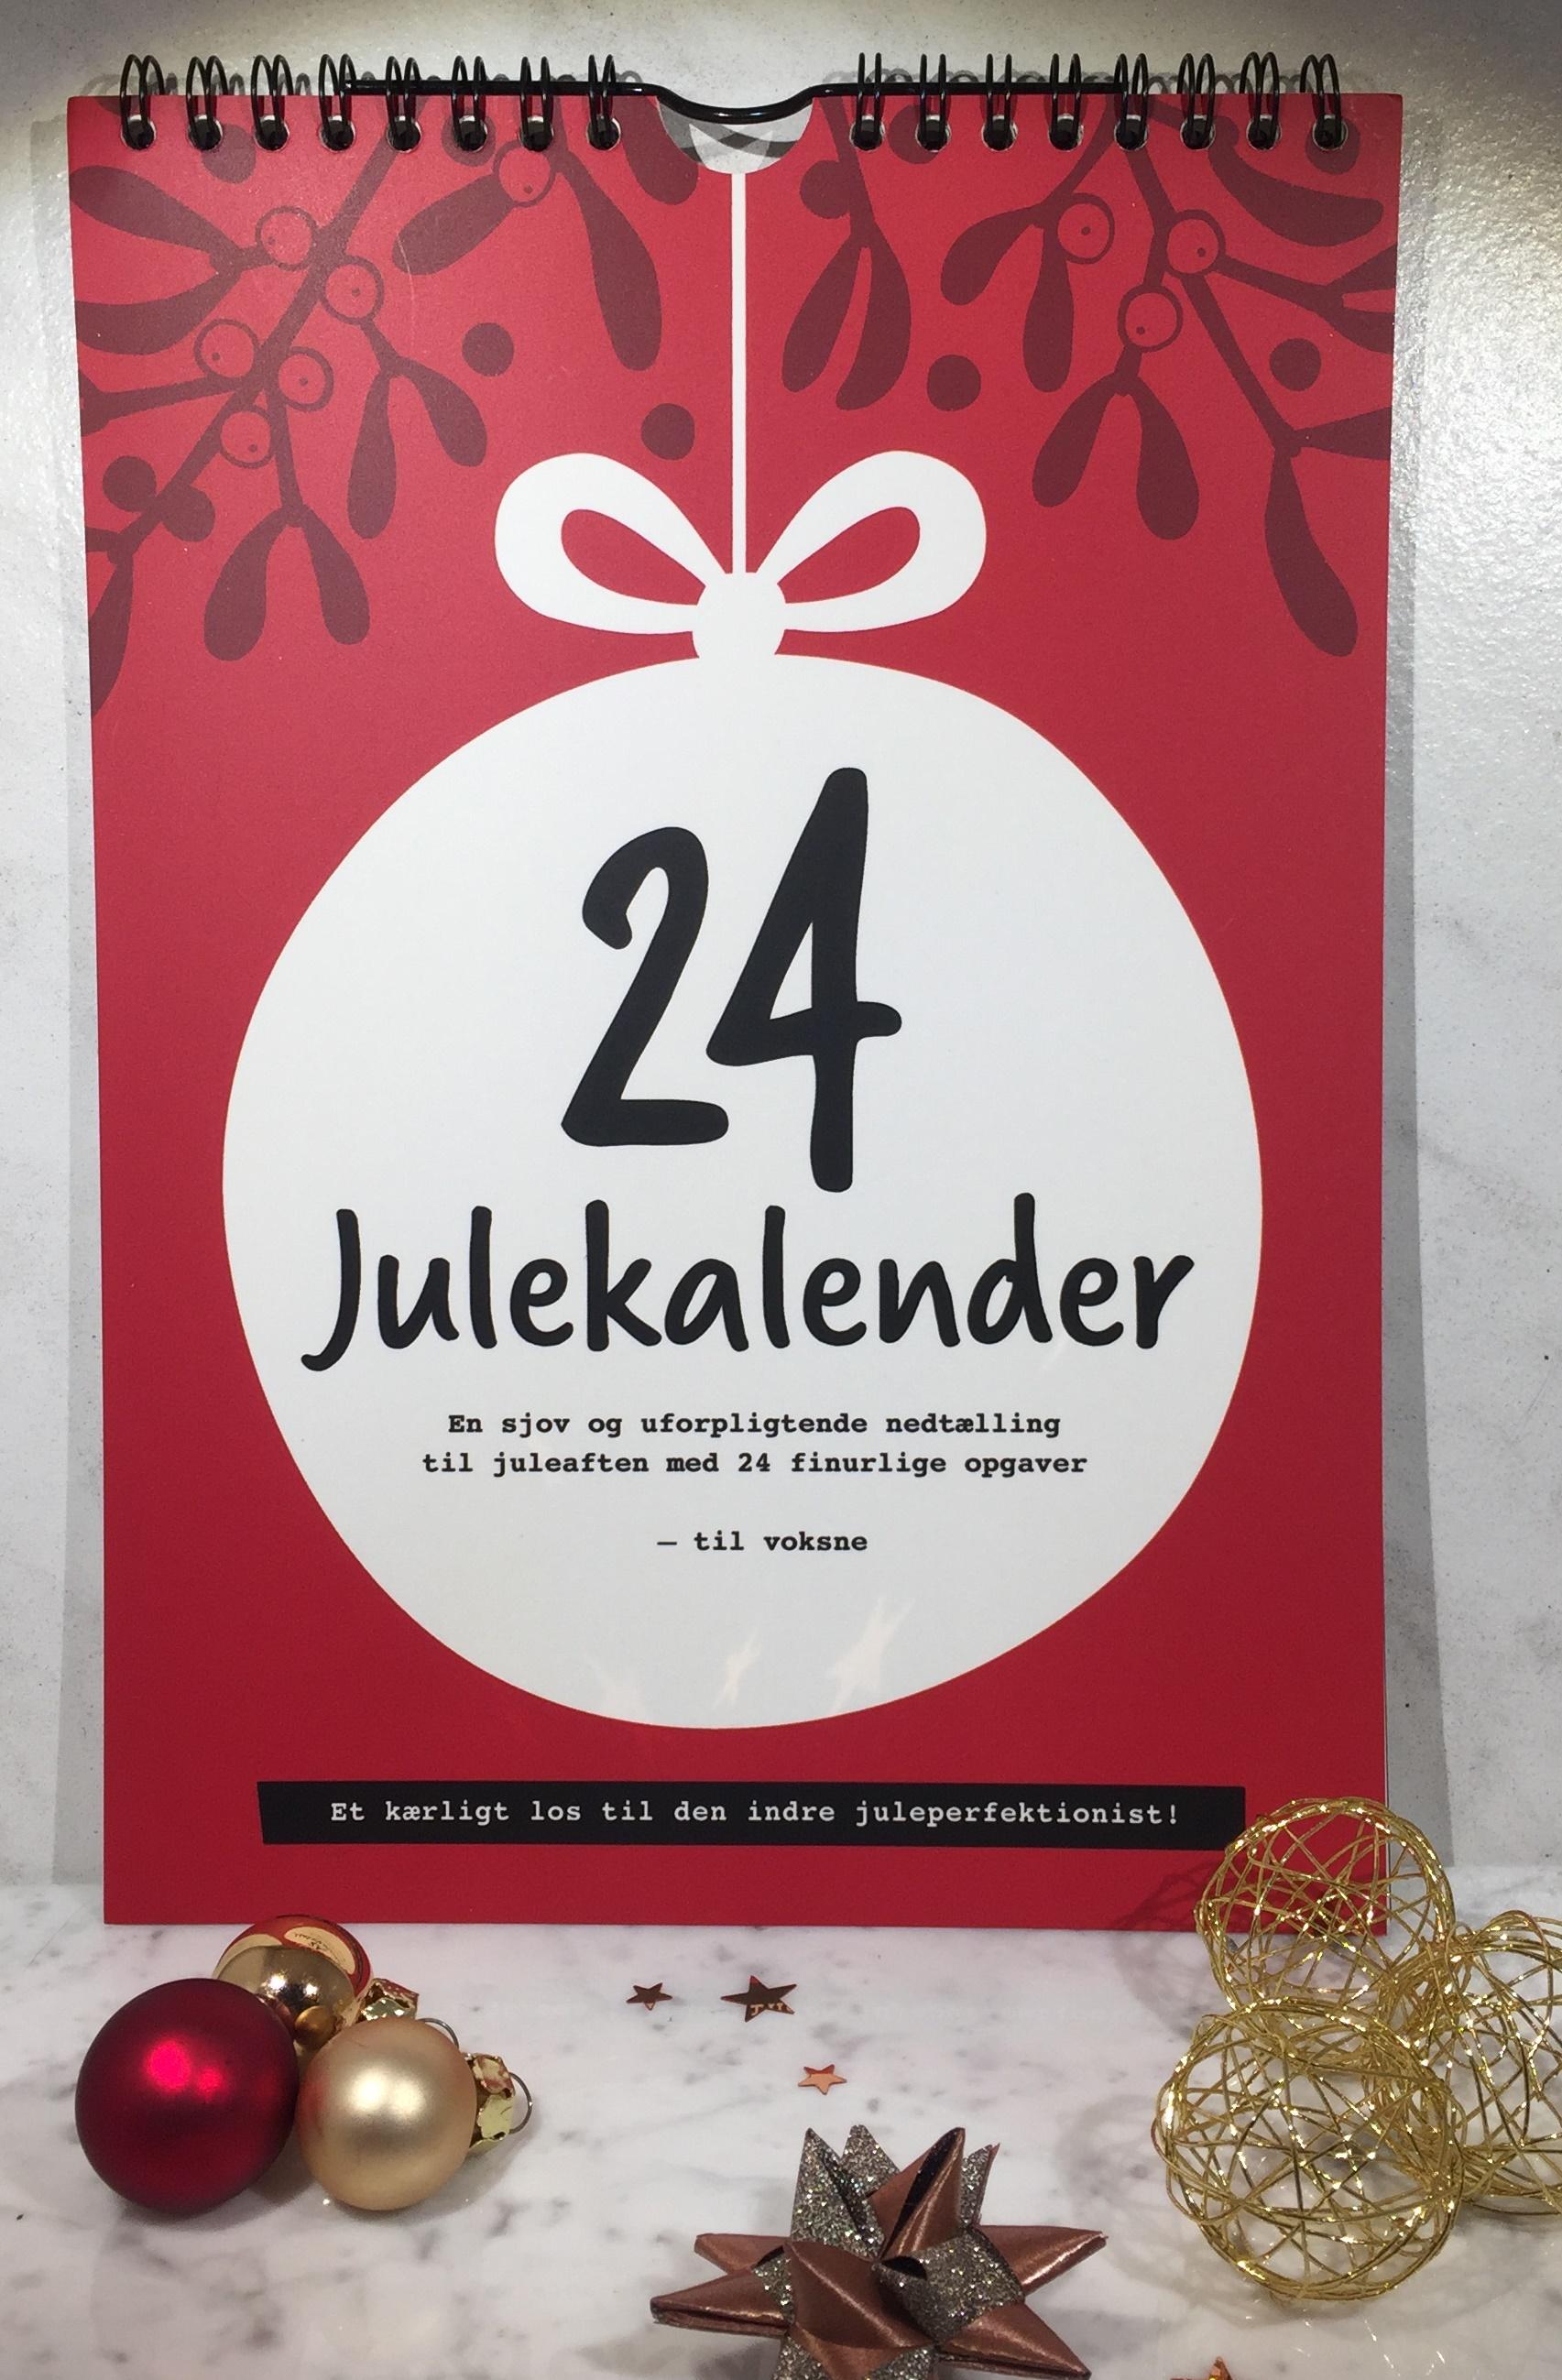 Julekalender, Julekalender 2017, 24Julekalender, 24 Julekalender, Julekalender Rød, Julekalender til juleelskere,